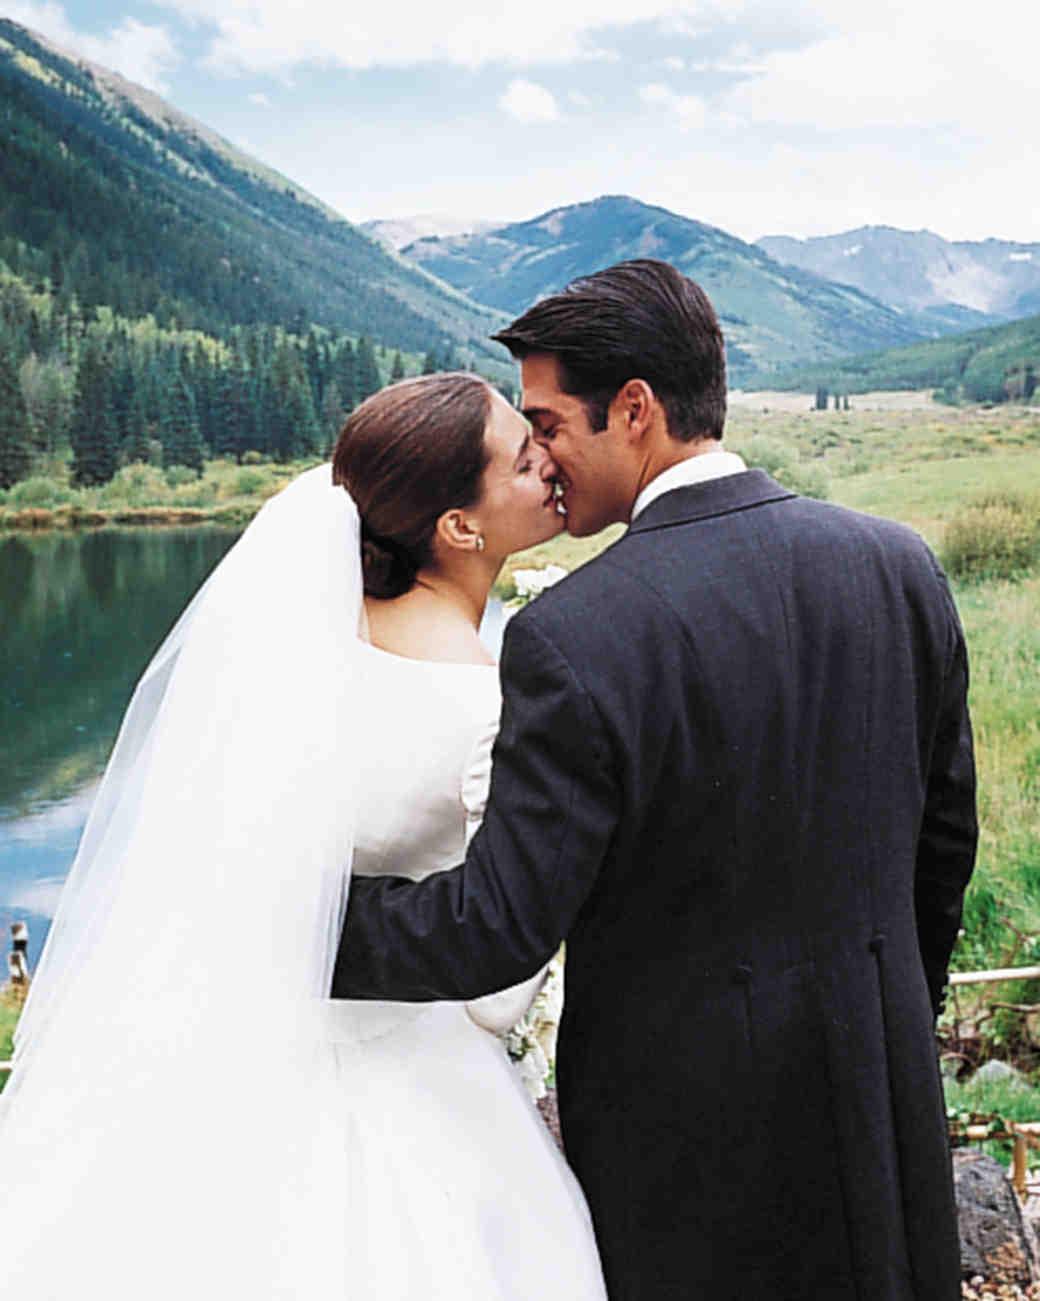 john-dolan-wedding-photographer-summer-2000-2-0914.jpg